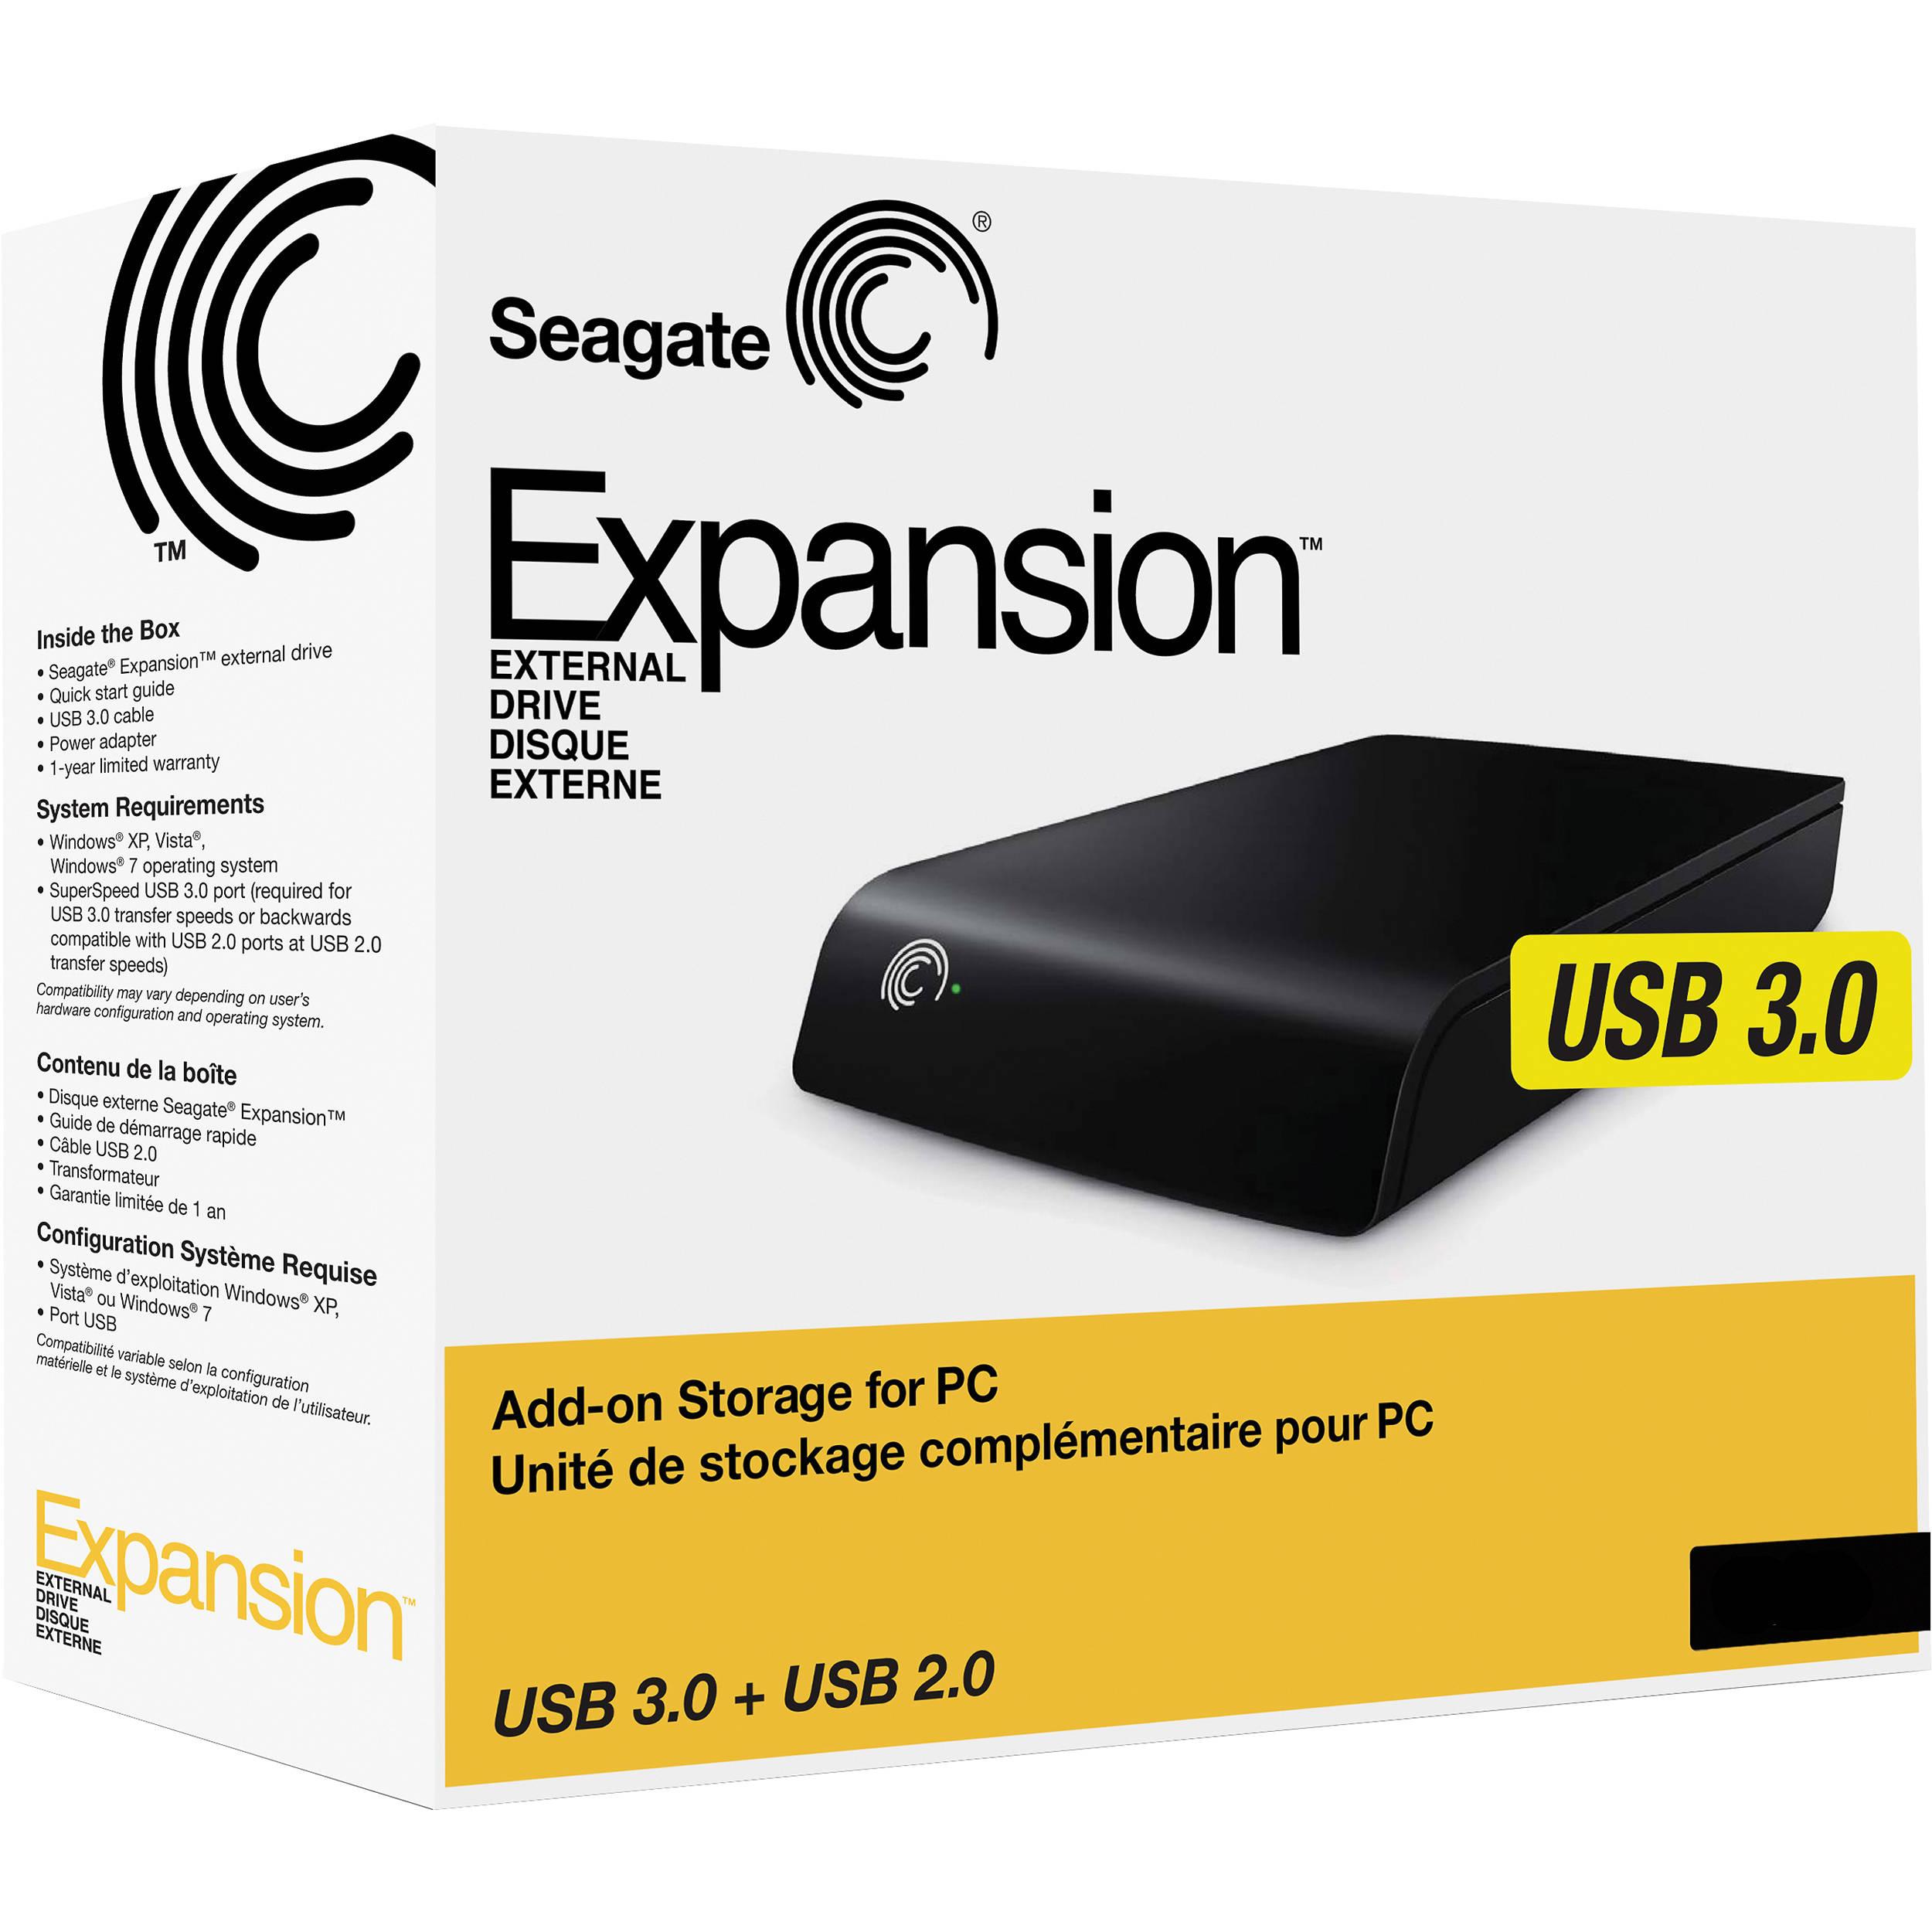 Seagate 1 TB Expansion External Hard Drive